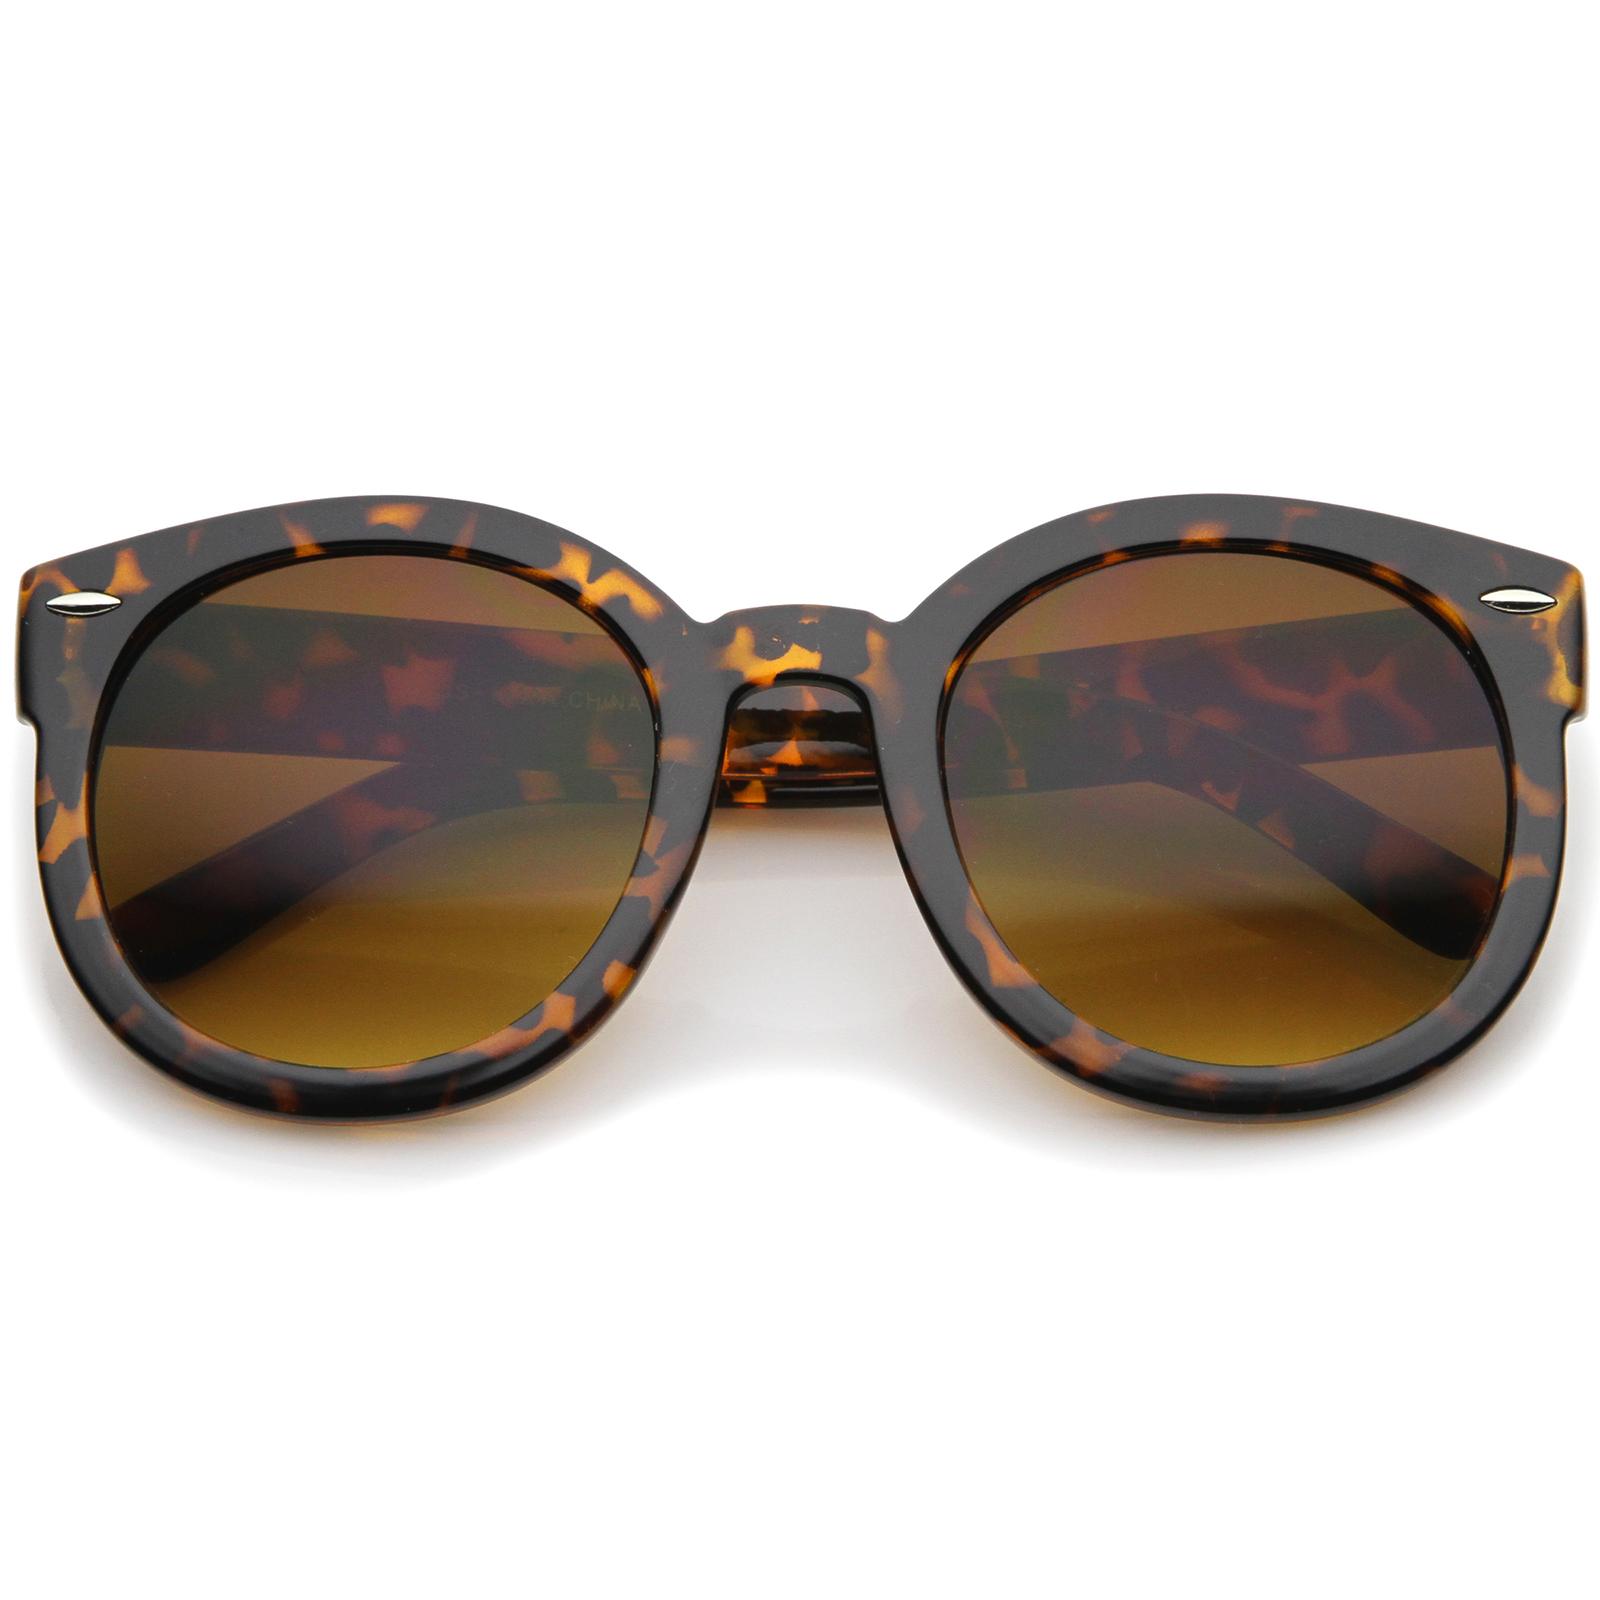 sunglassLA-Women-039-s-Retro-Oversize-Horn-Rimmed-P3-Round-Sunglasses